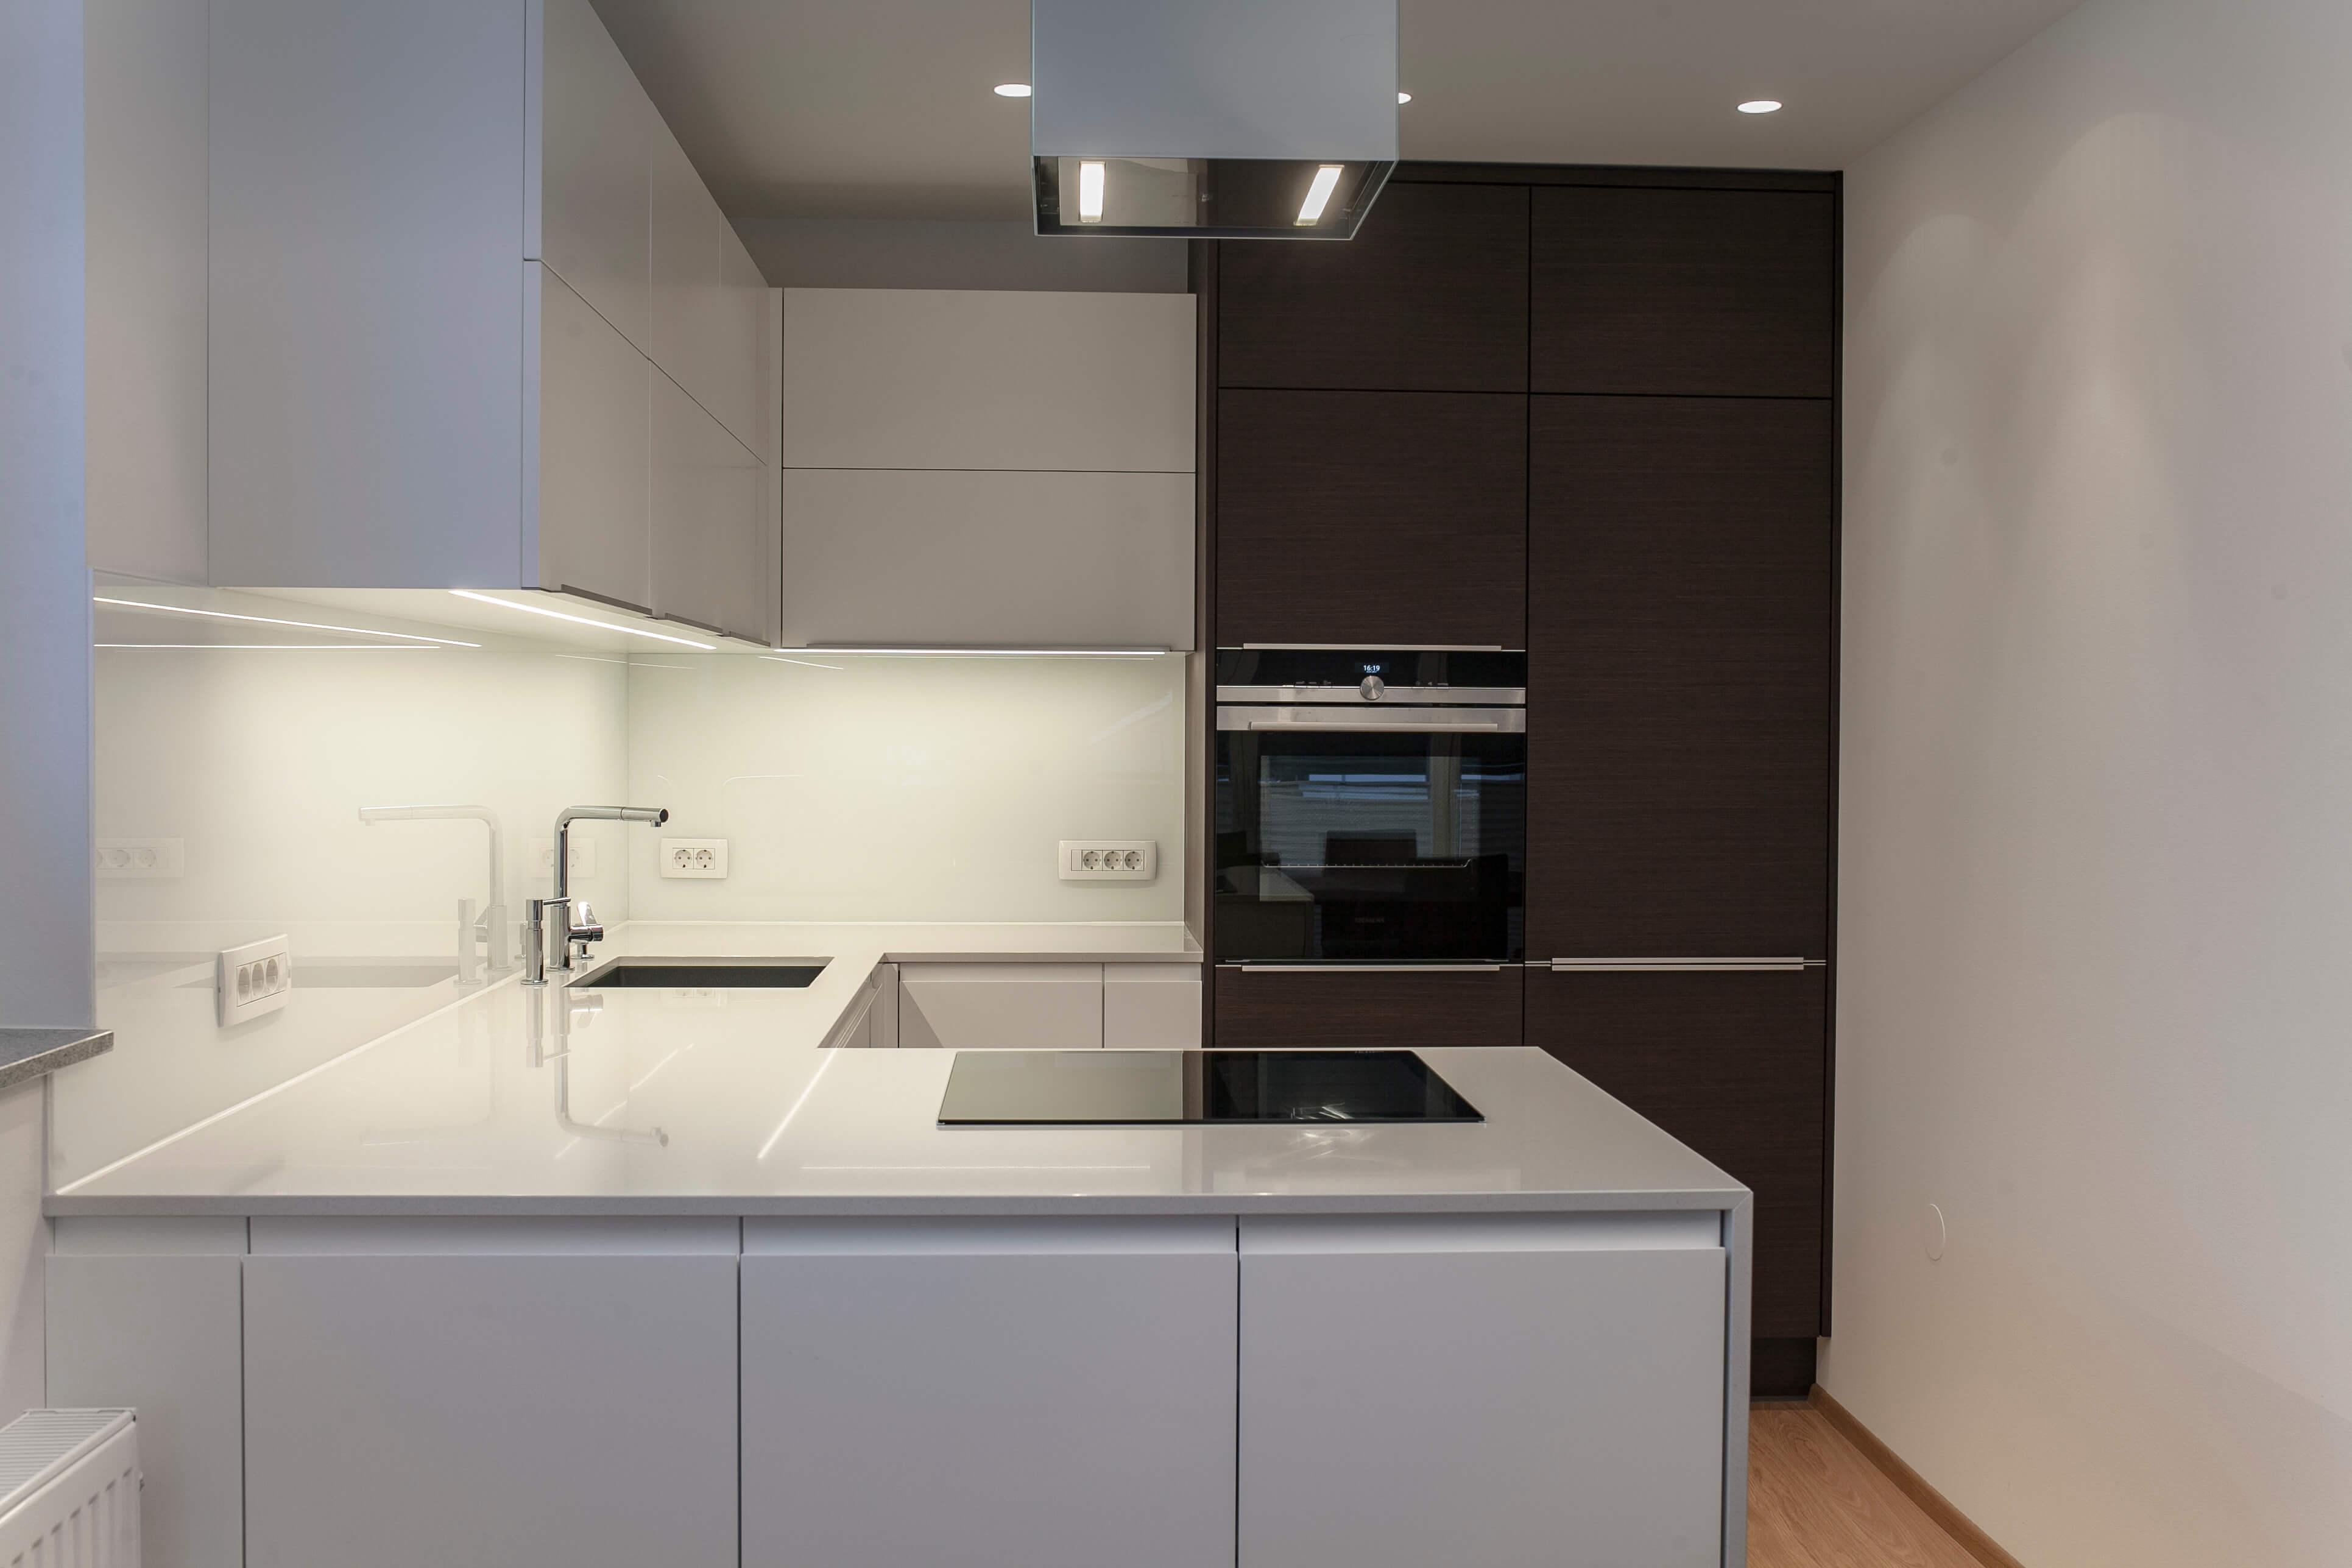 moderna kuhinja po meri bela in furnirana pult umetni kamen